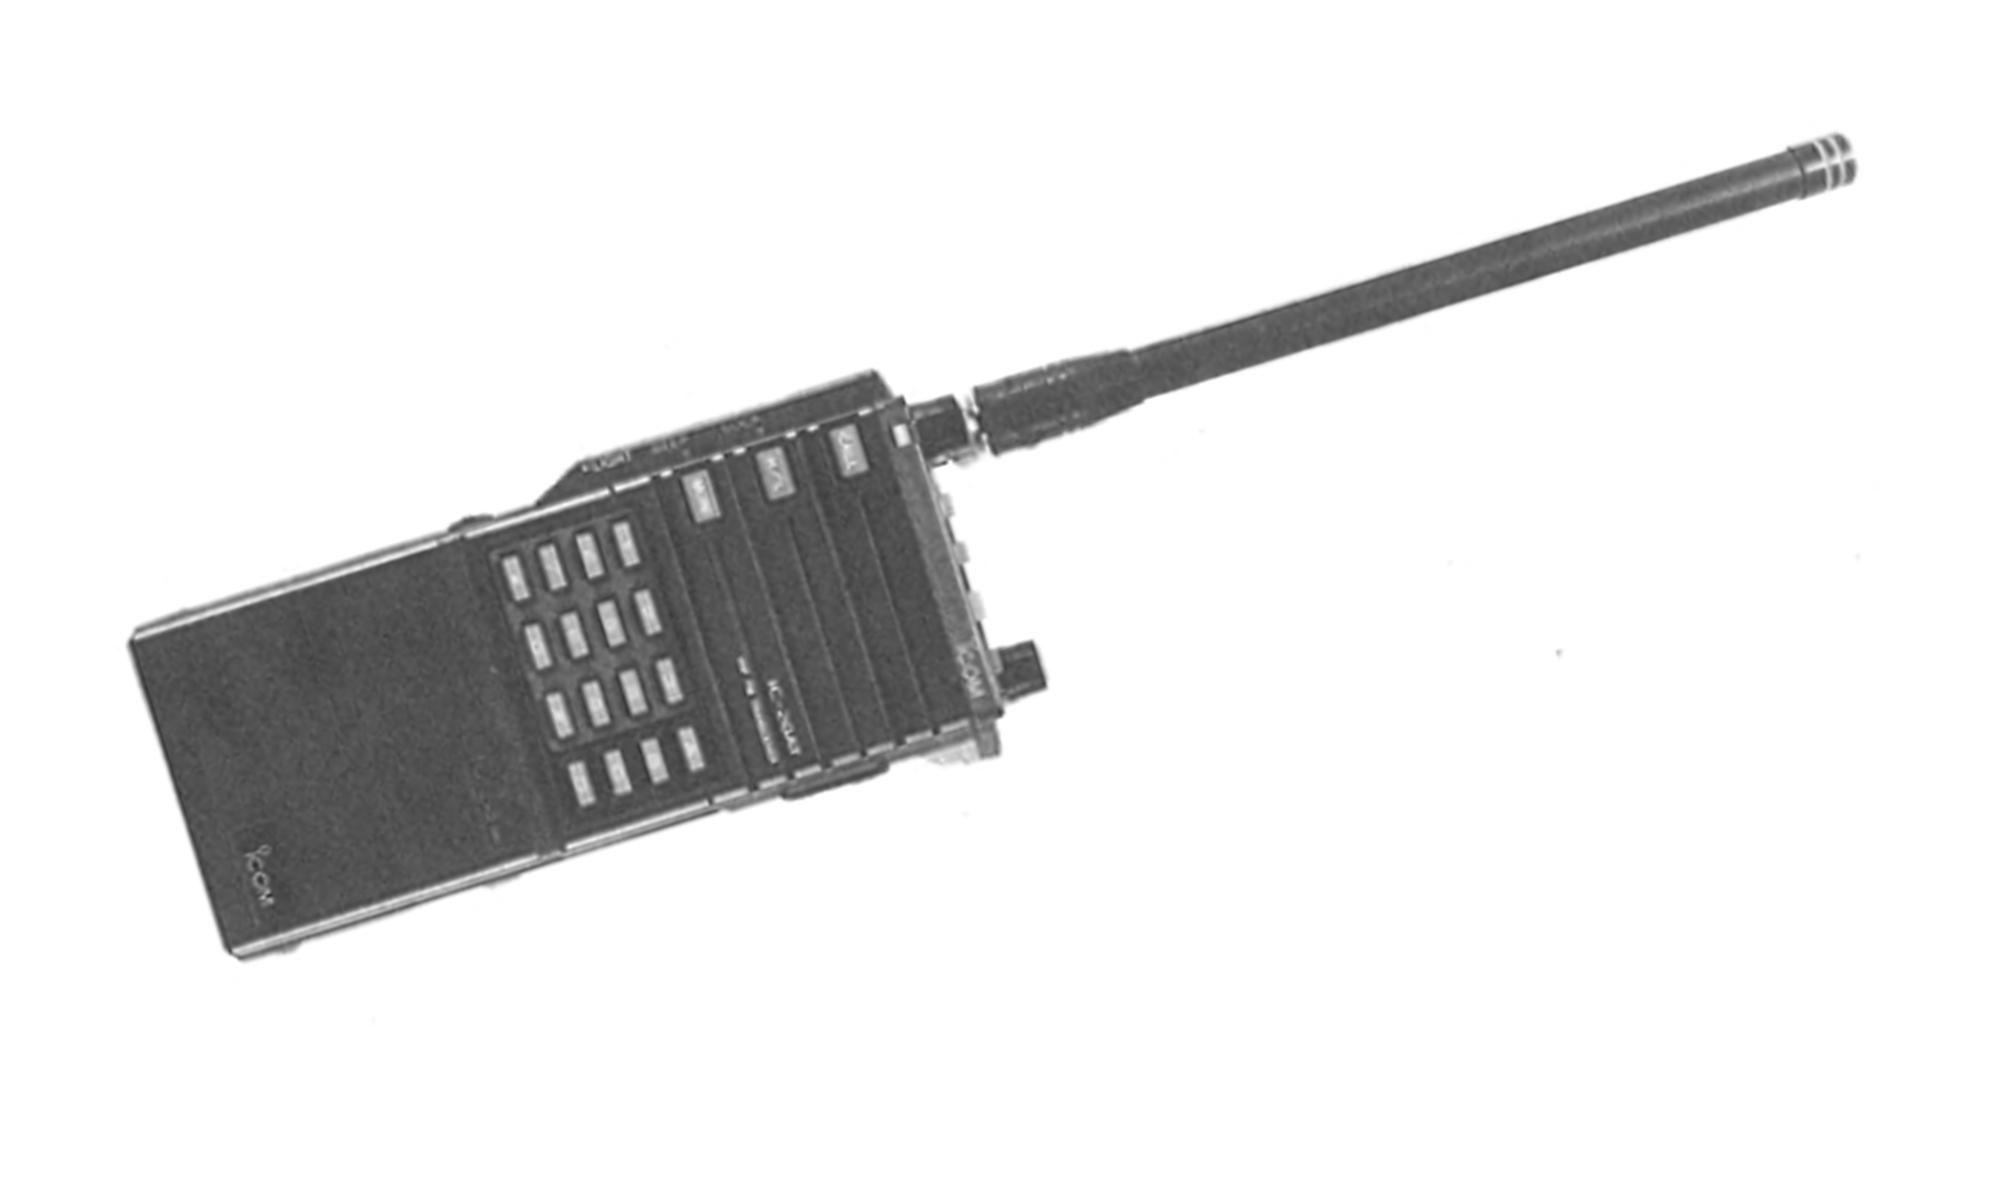 IC-2GAT/GAT/GE VHF FM Transceiver Service Manual Archives | DW1ZWS